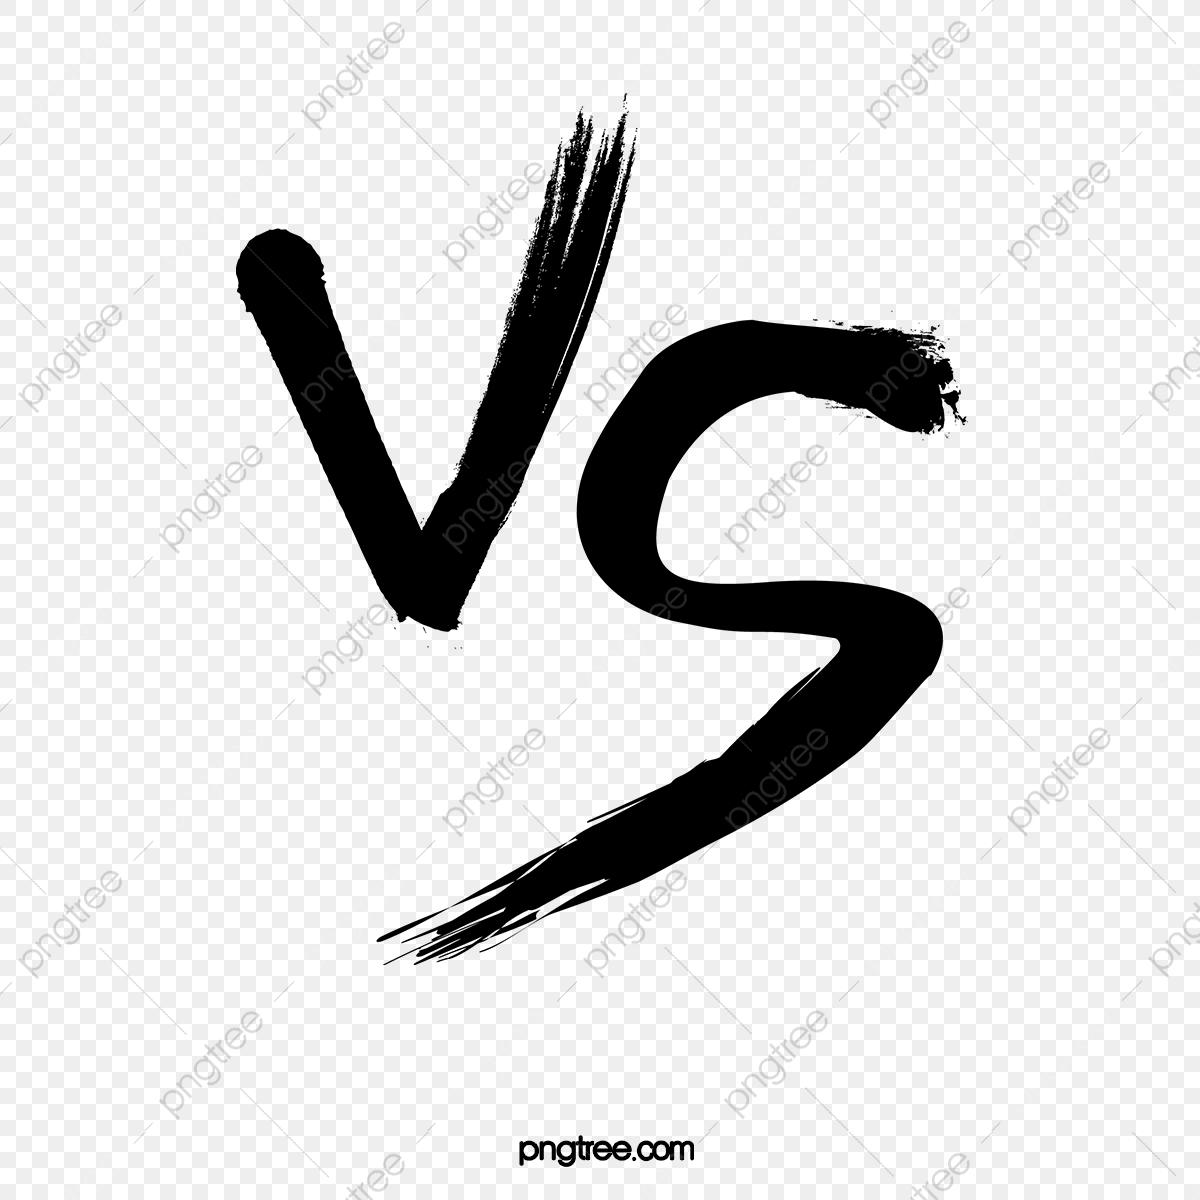 Vs, Showdown, Competition, Ultimate Pk PNG Transparent Clipart Image.